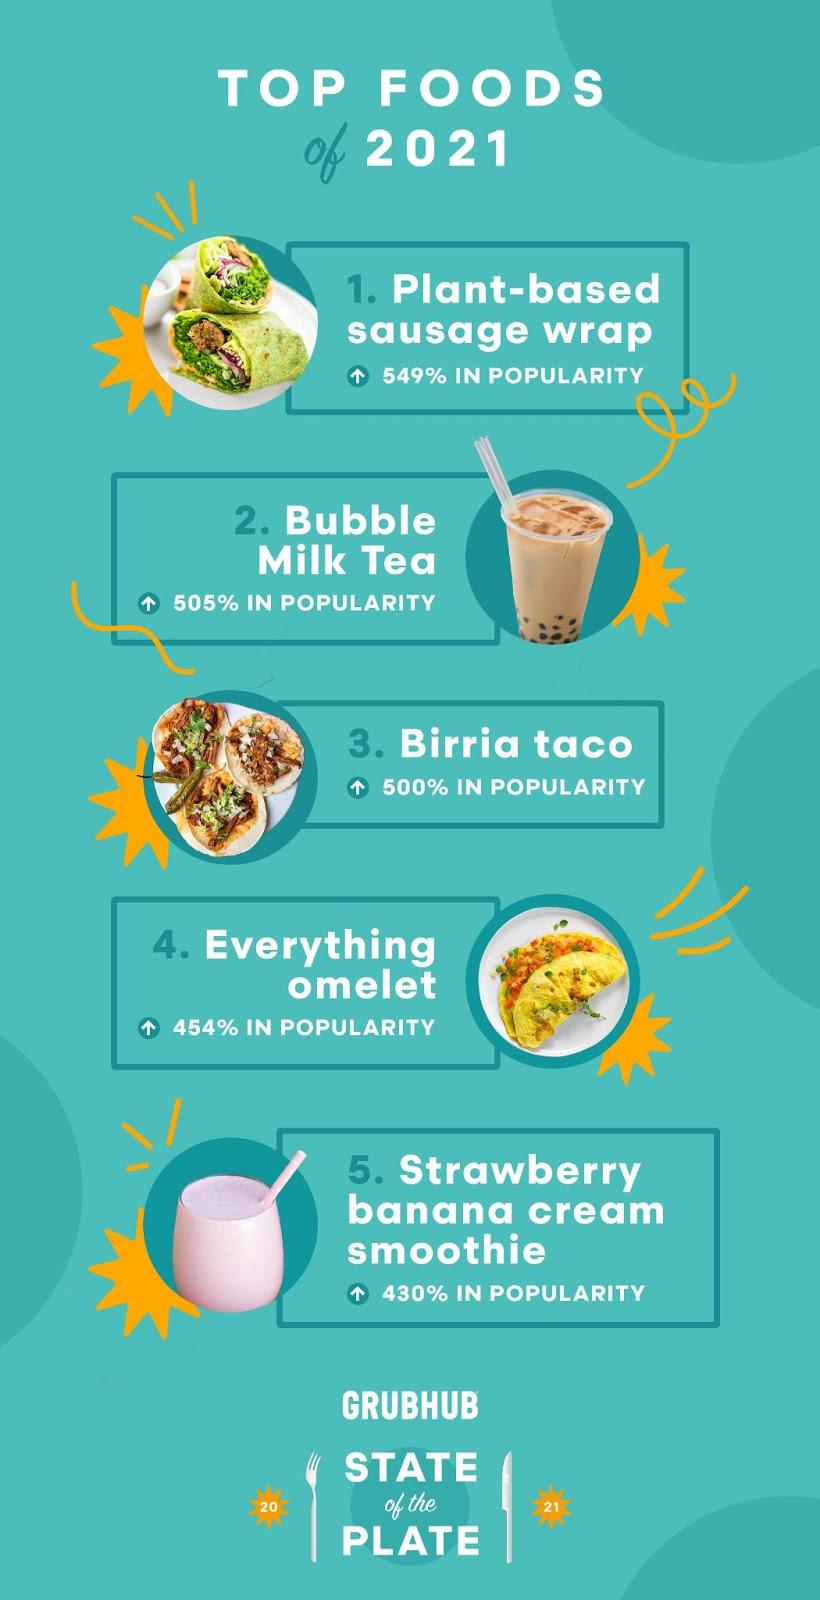 Grubhub Top foods